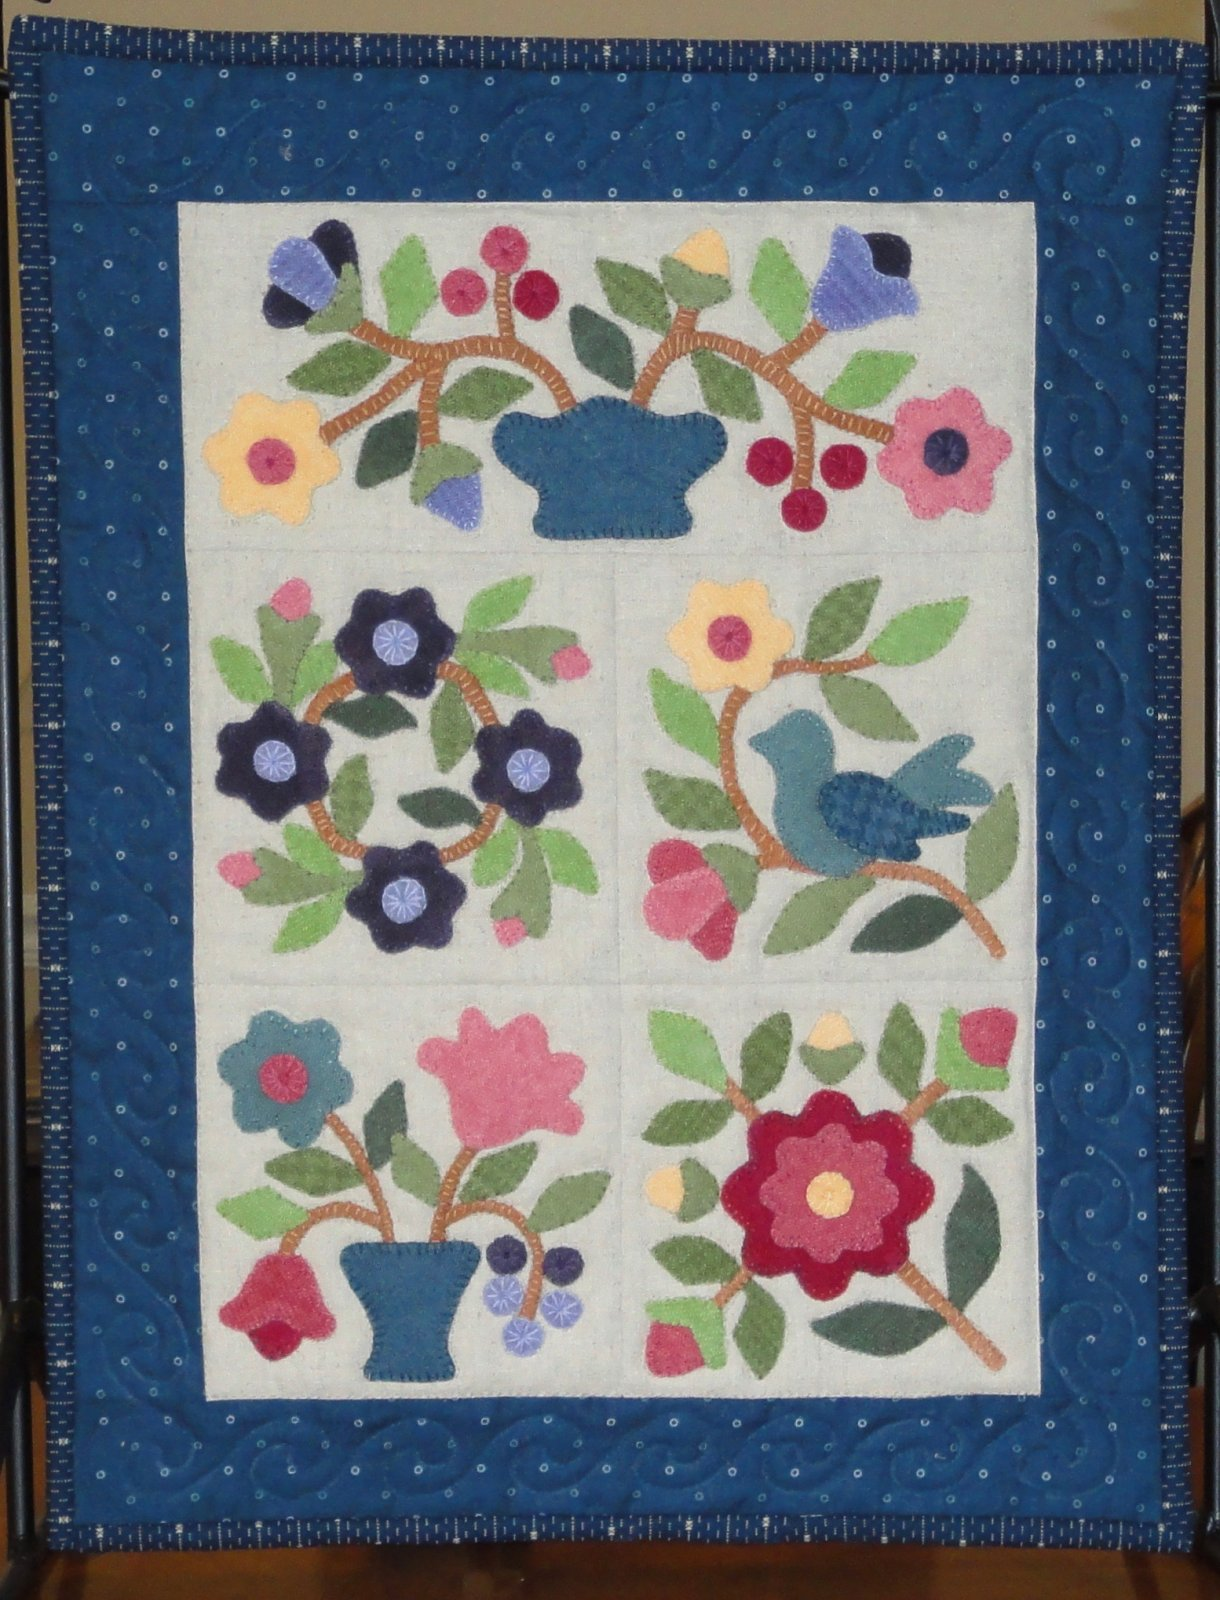 Blueberry Hill- Pattern by Lori Smith